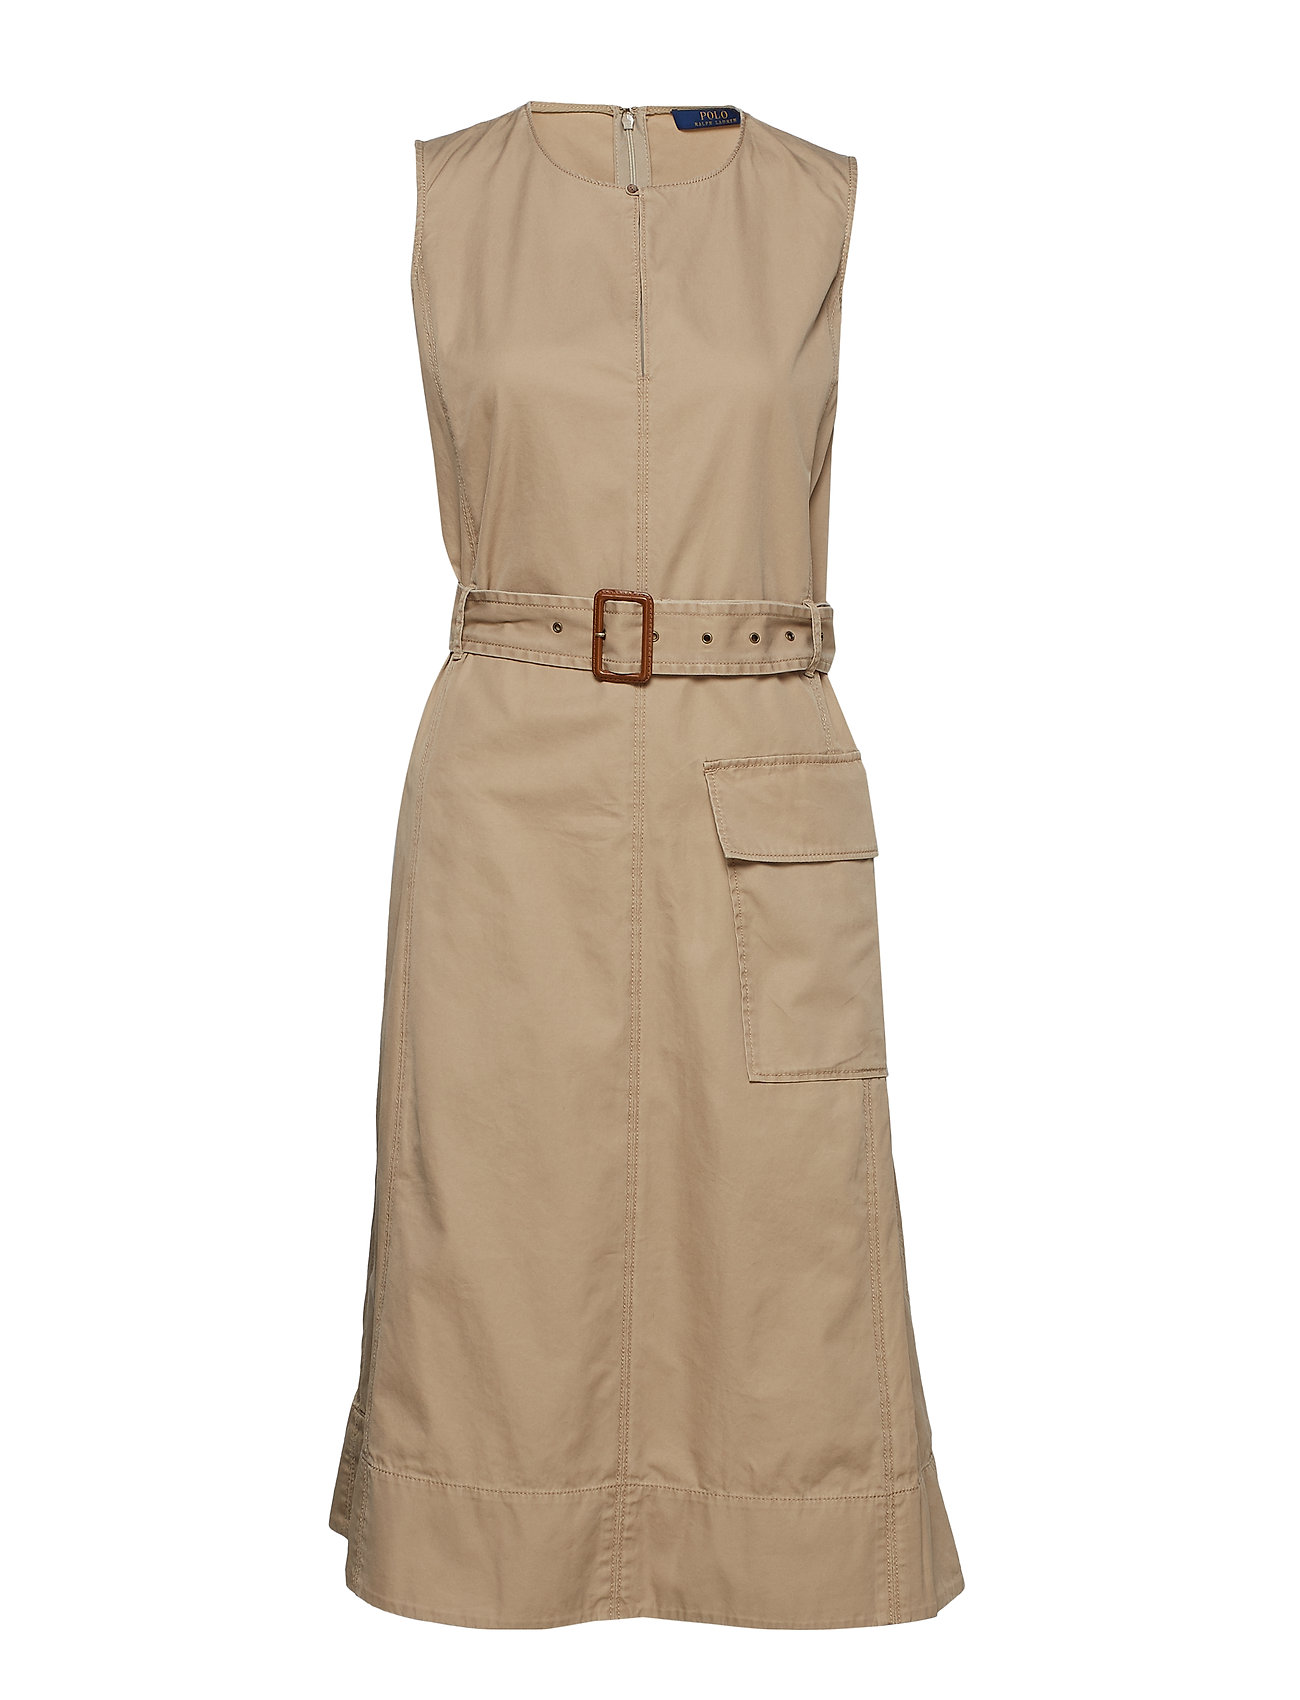 Polo Ralph Lauren Chino Belted Sleeveless Dress